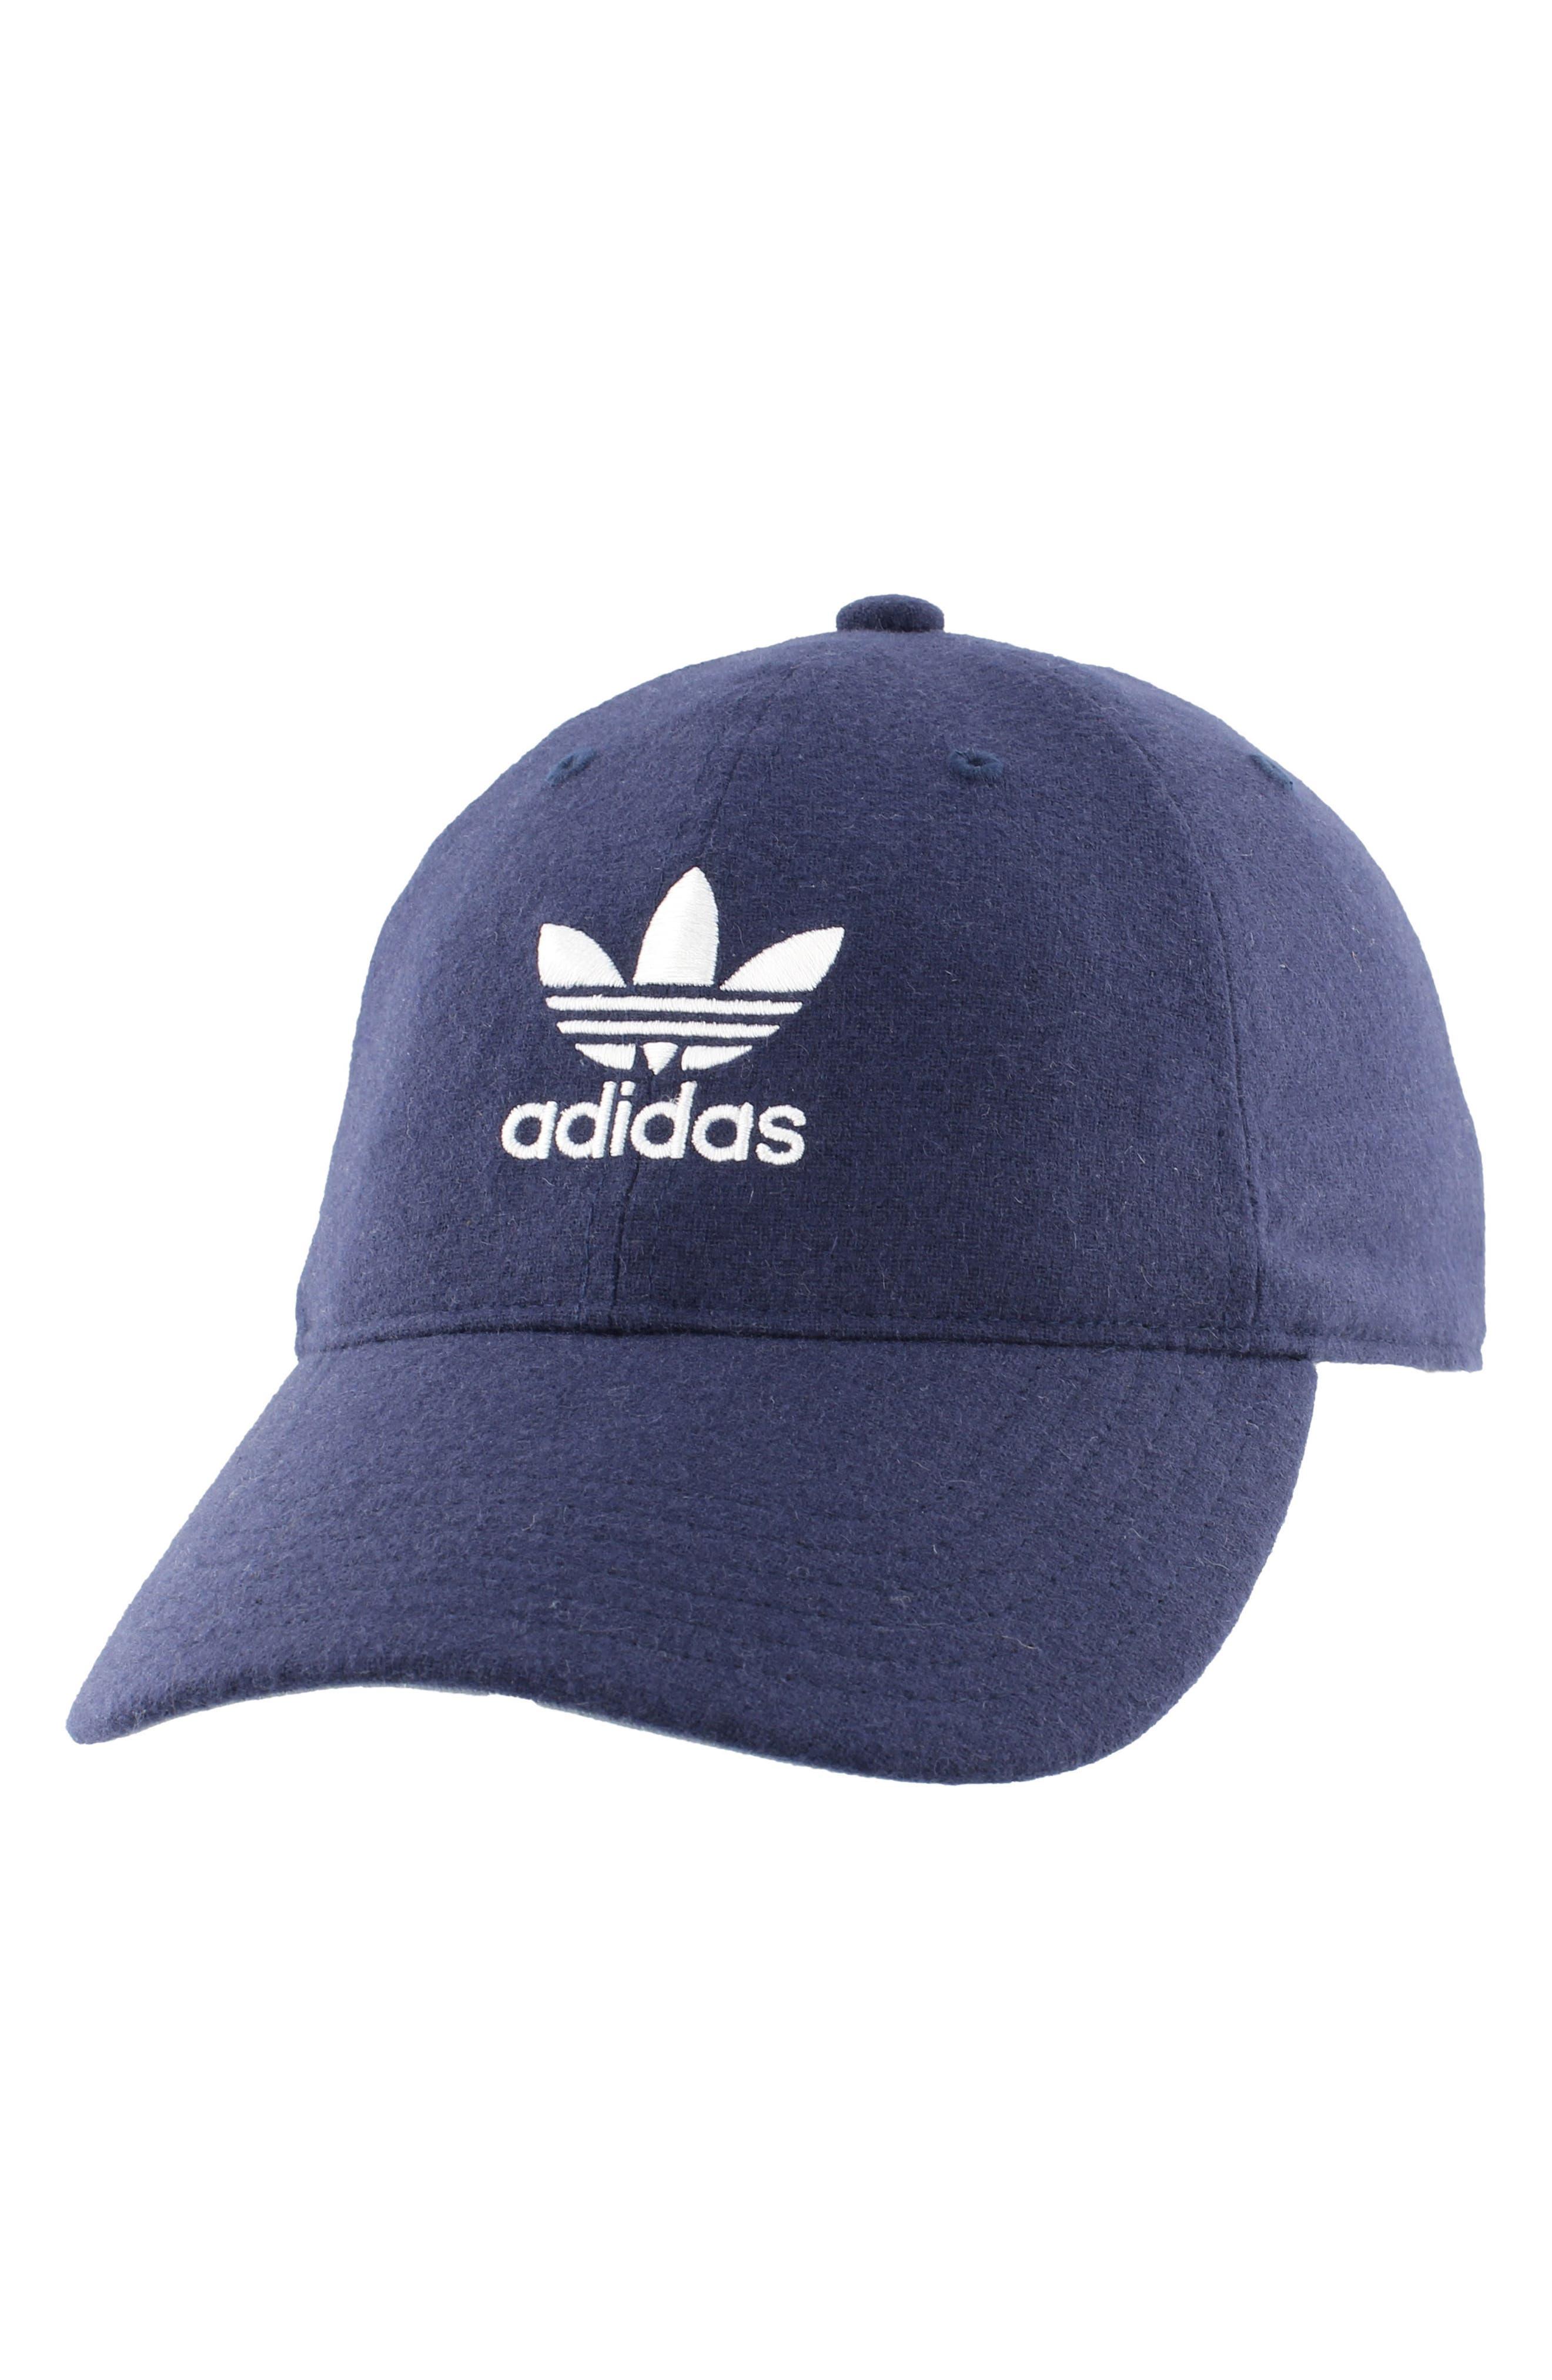 186083fe2901c ADIDAS ORIGINALS RELAXED PLUS BASEBALL CAP - BLUE